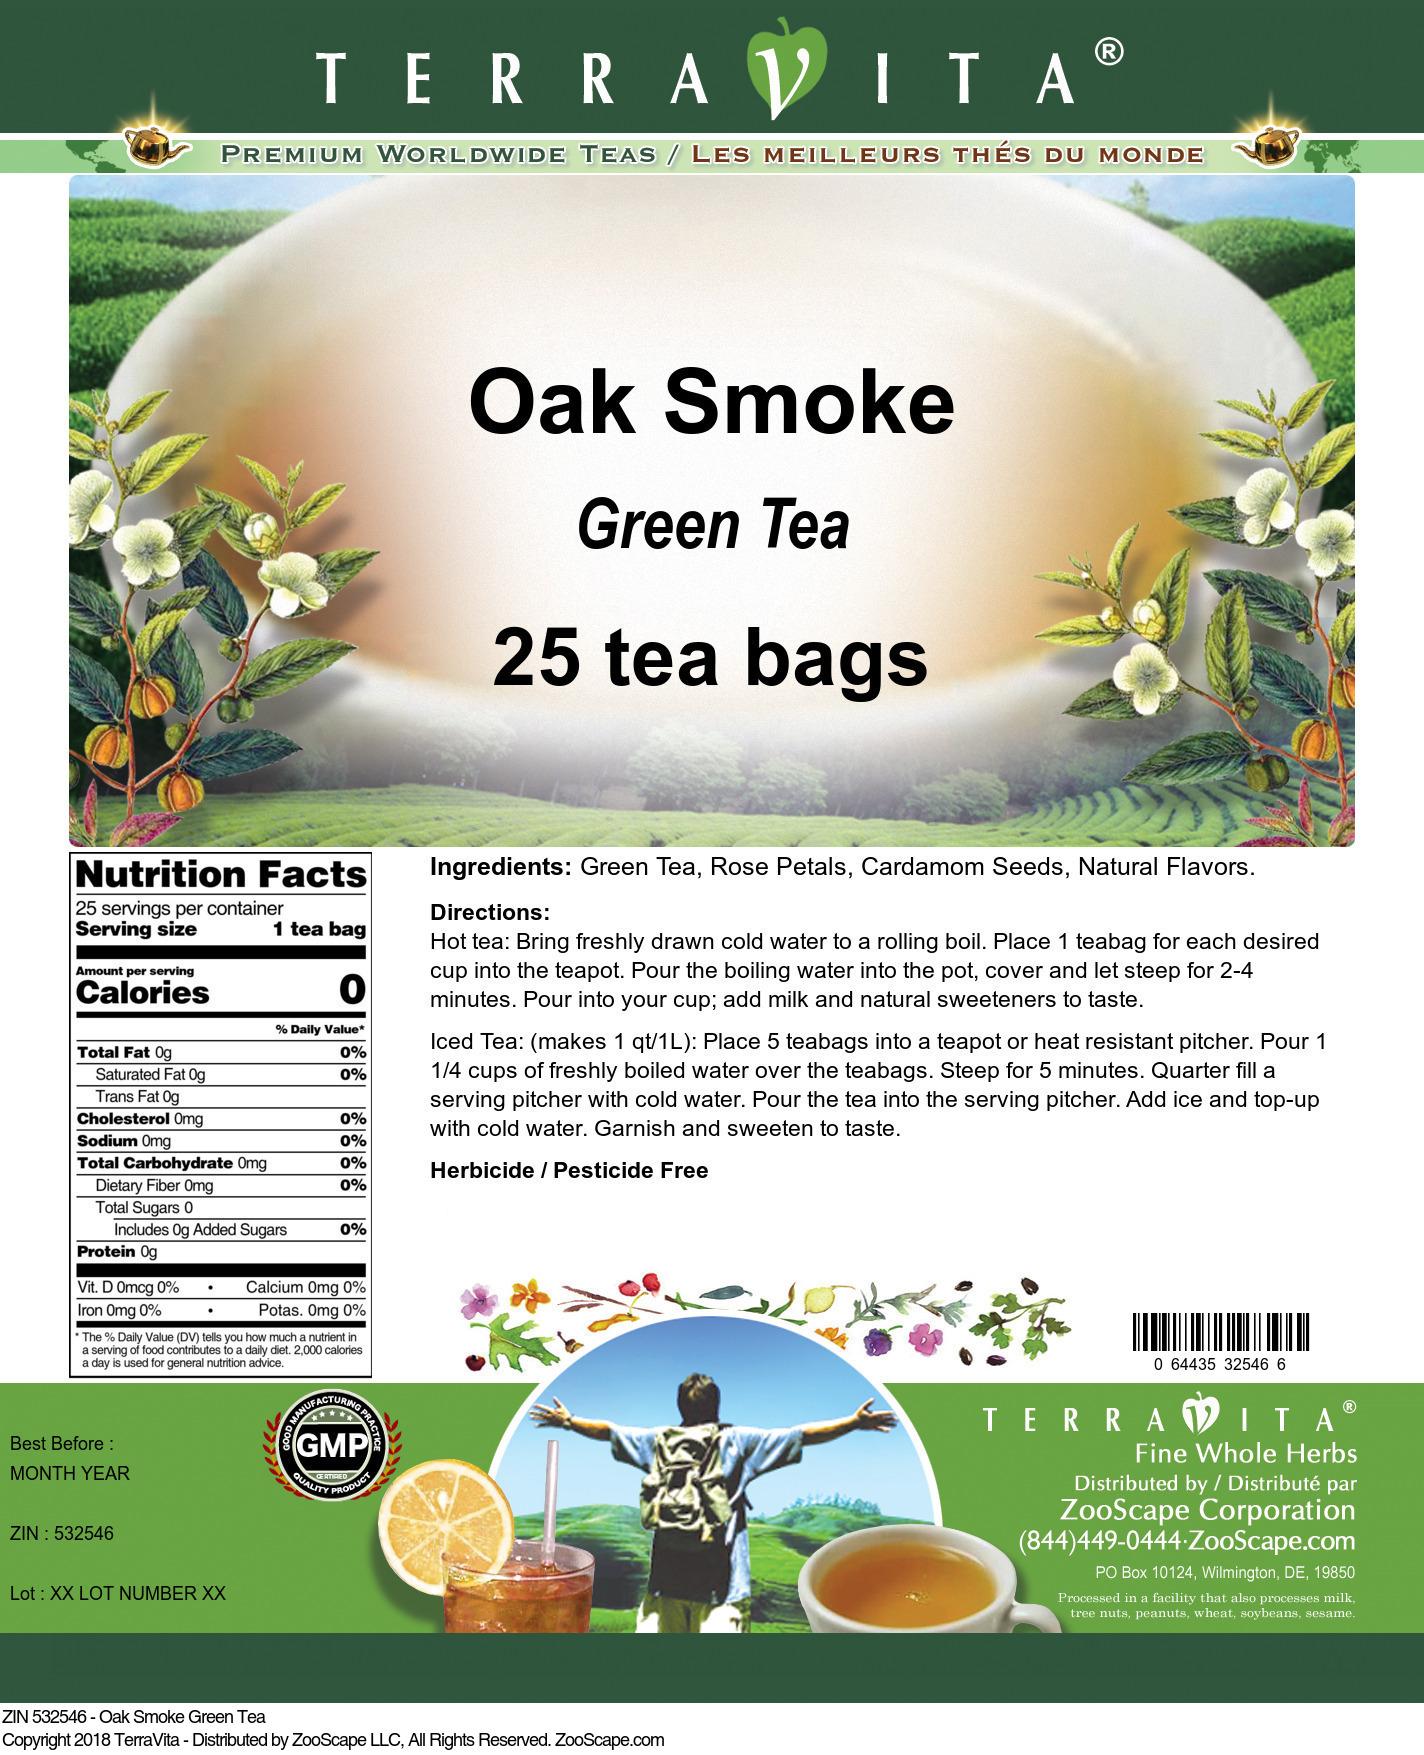 Oak Smoke Green Tea